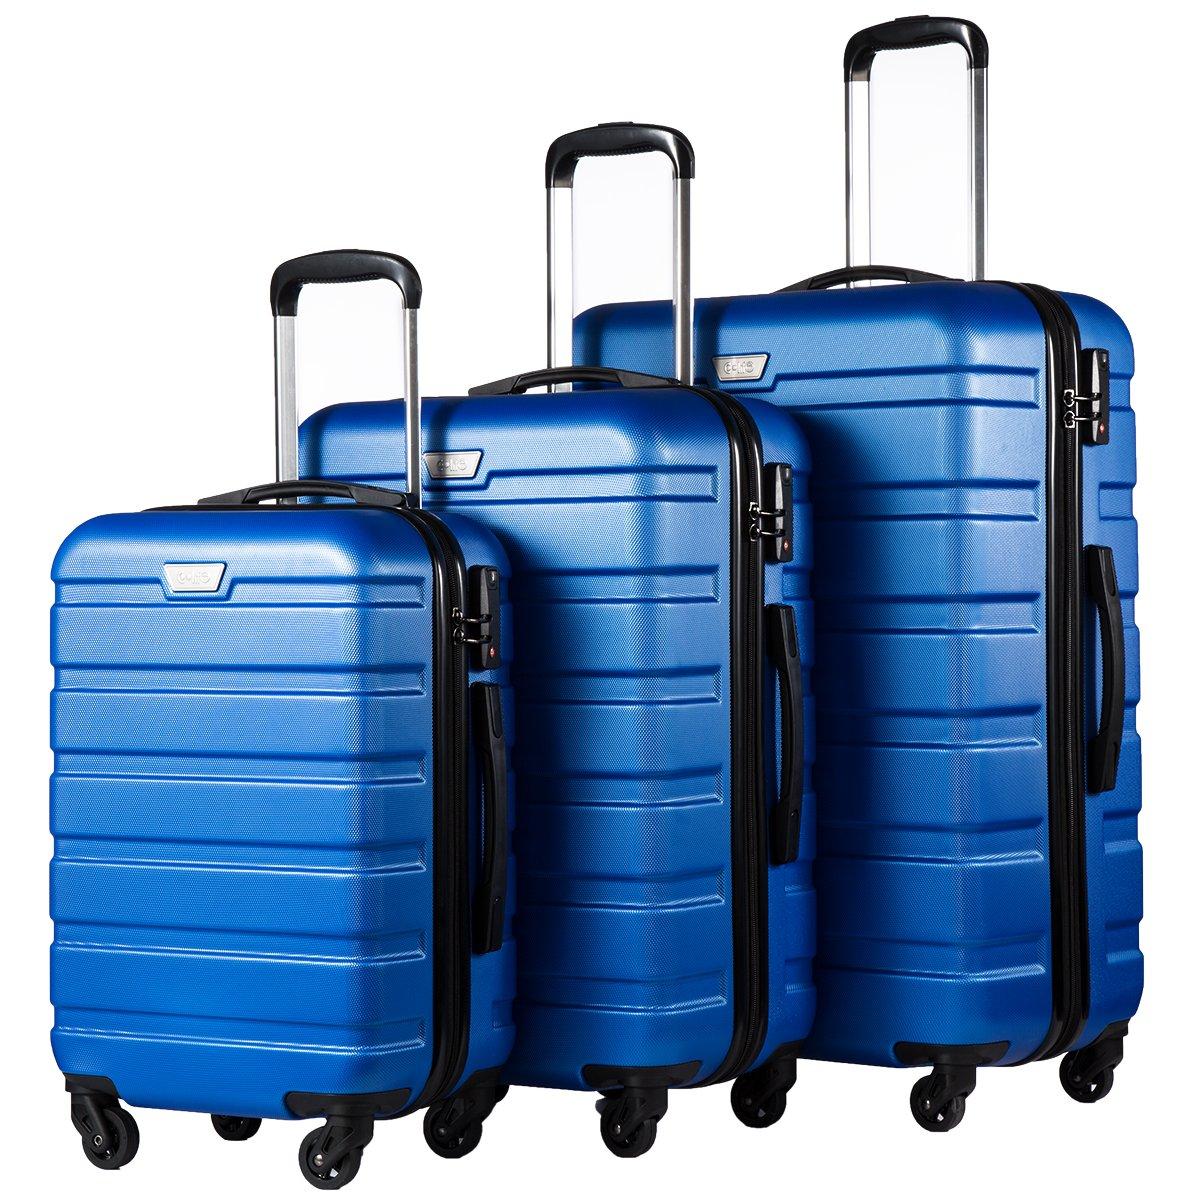 TravelCross Columbia 3 Piece Luggage Set